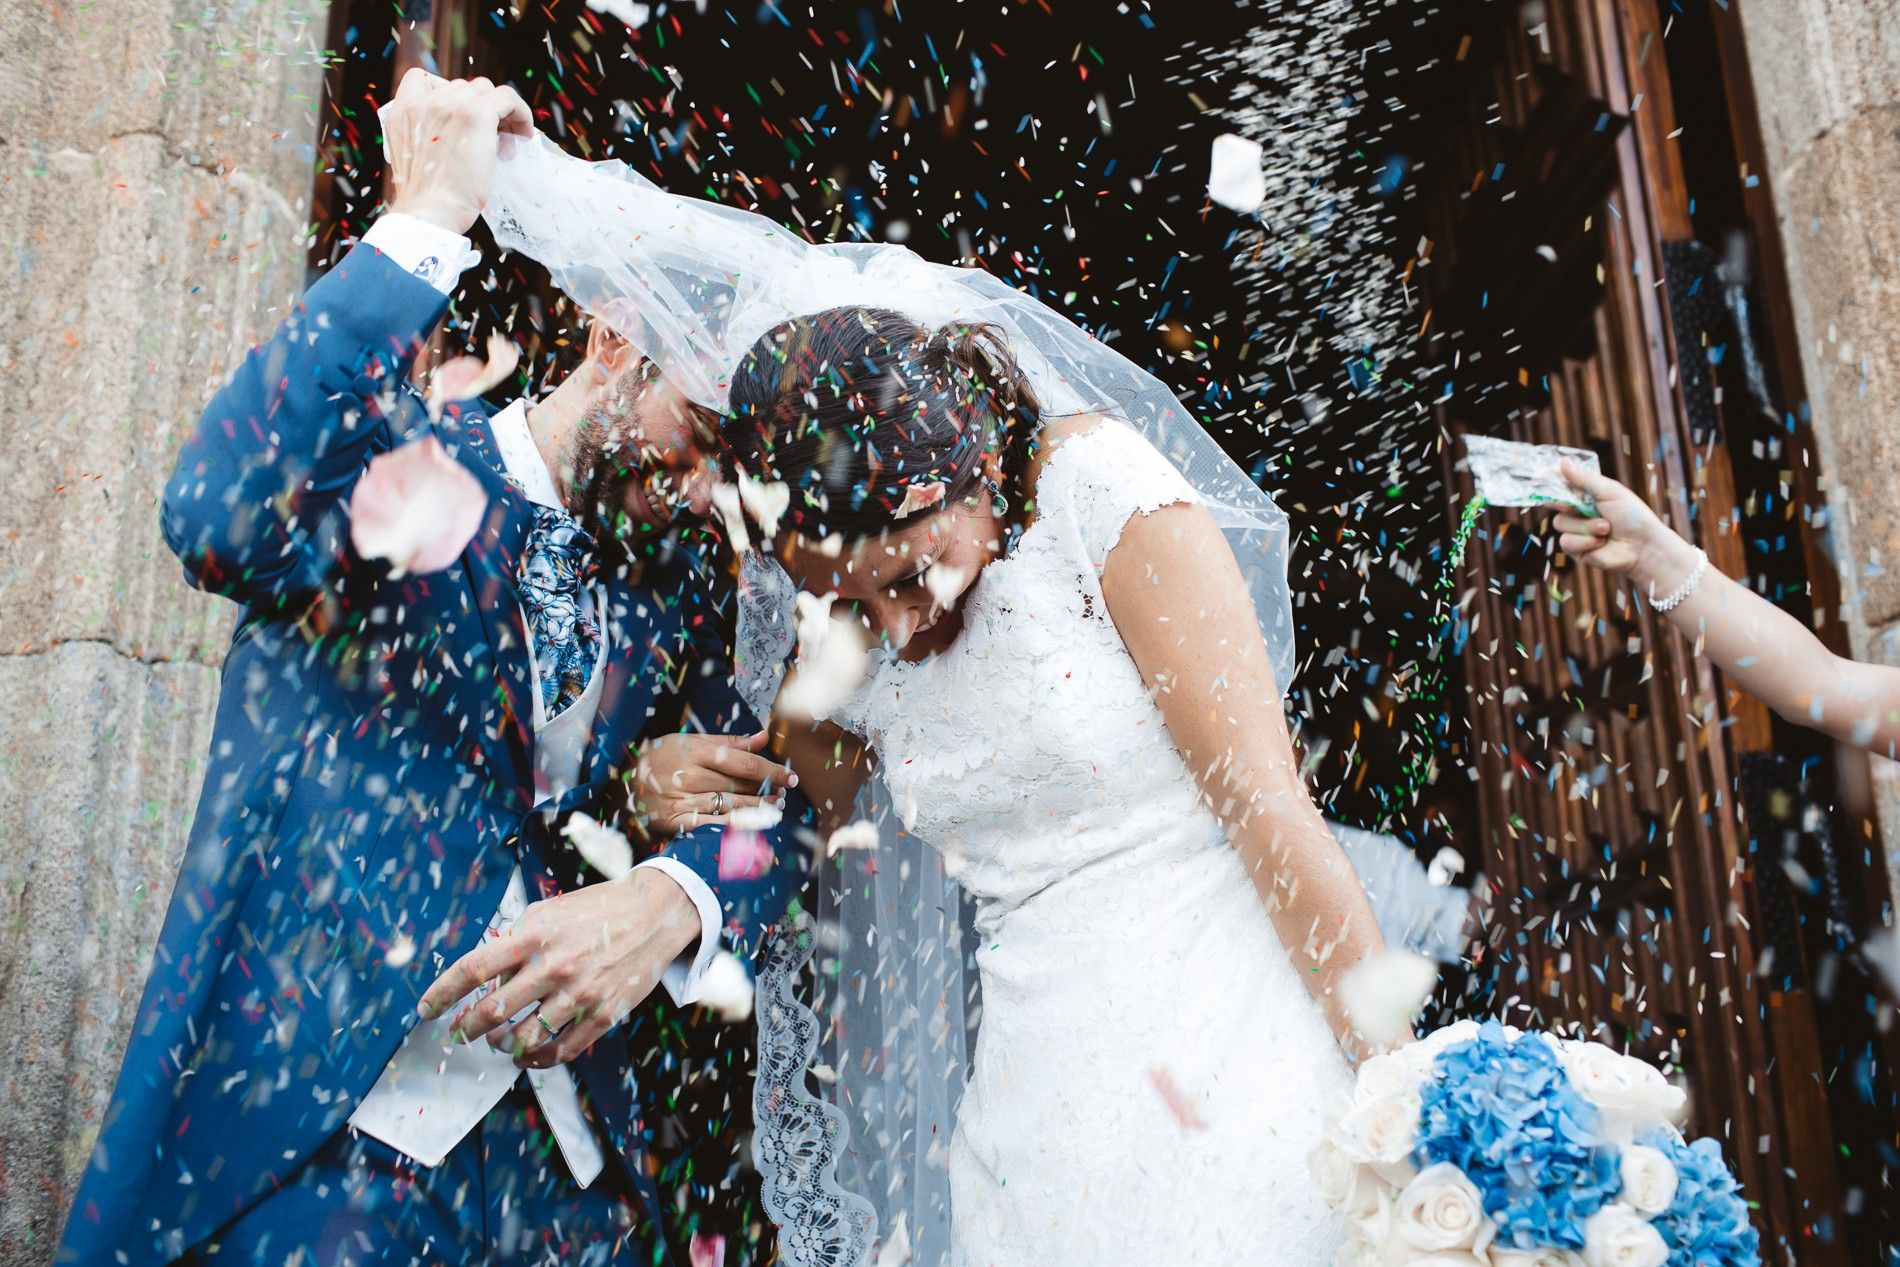 fotografo-de-boda-plasencia-25